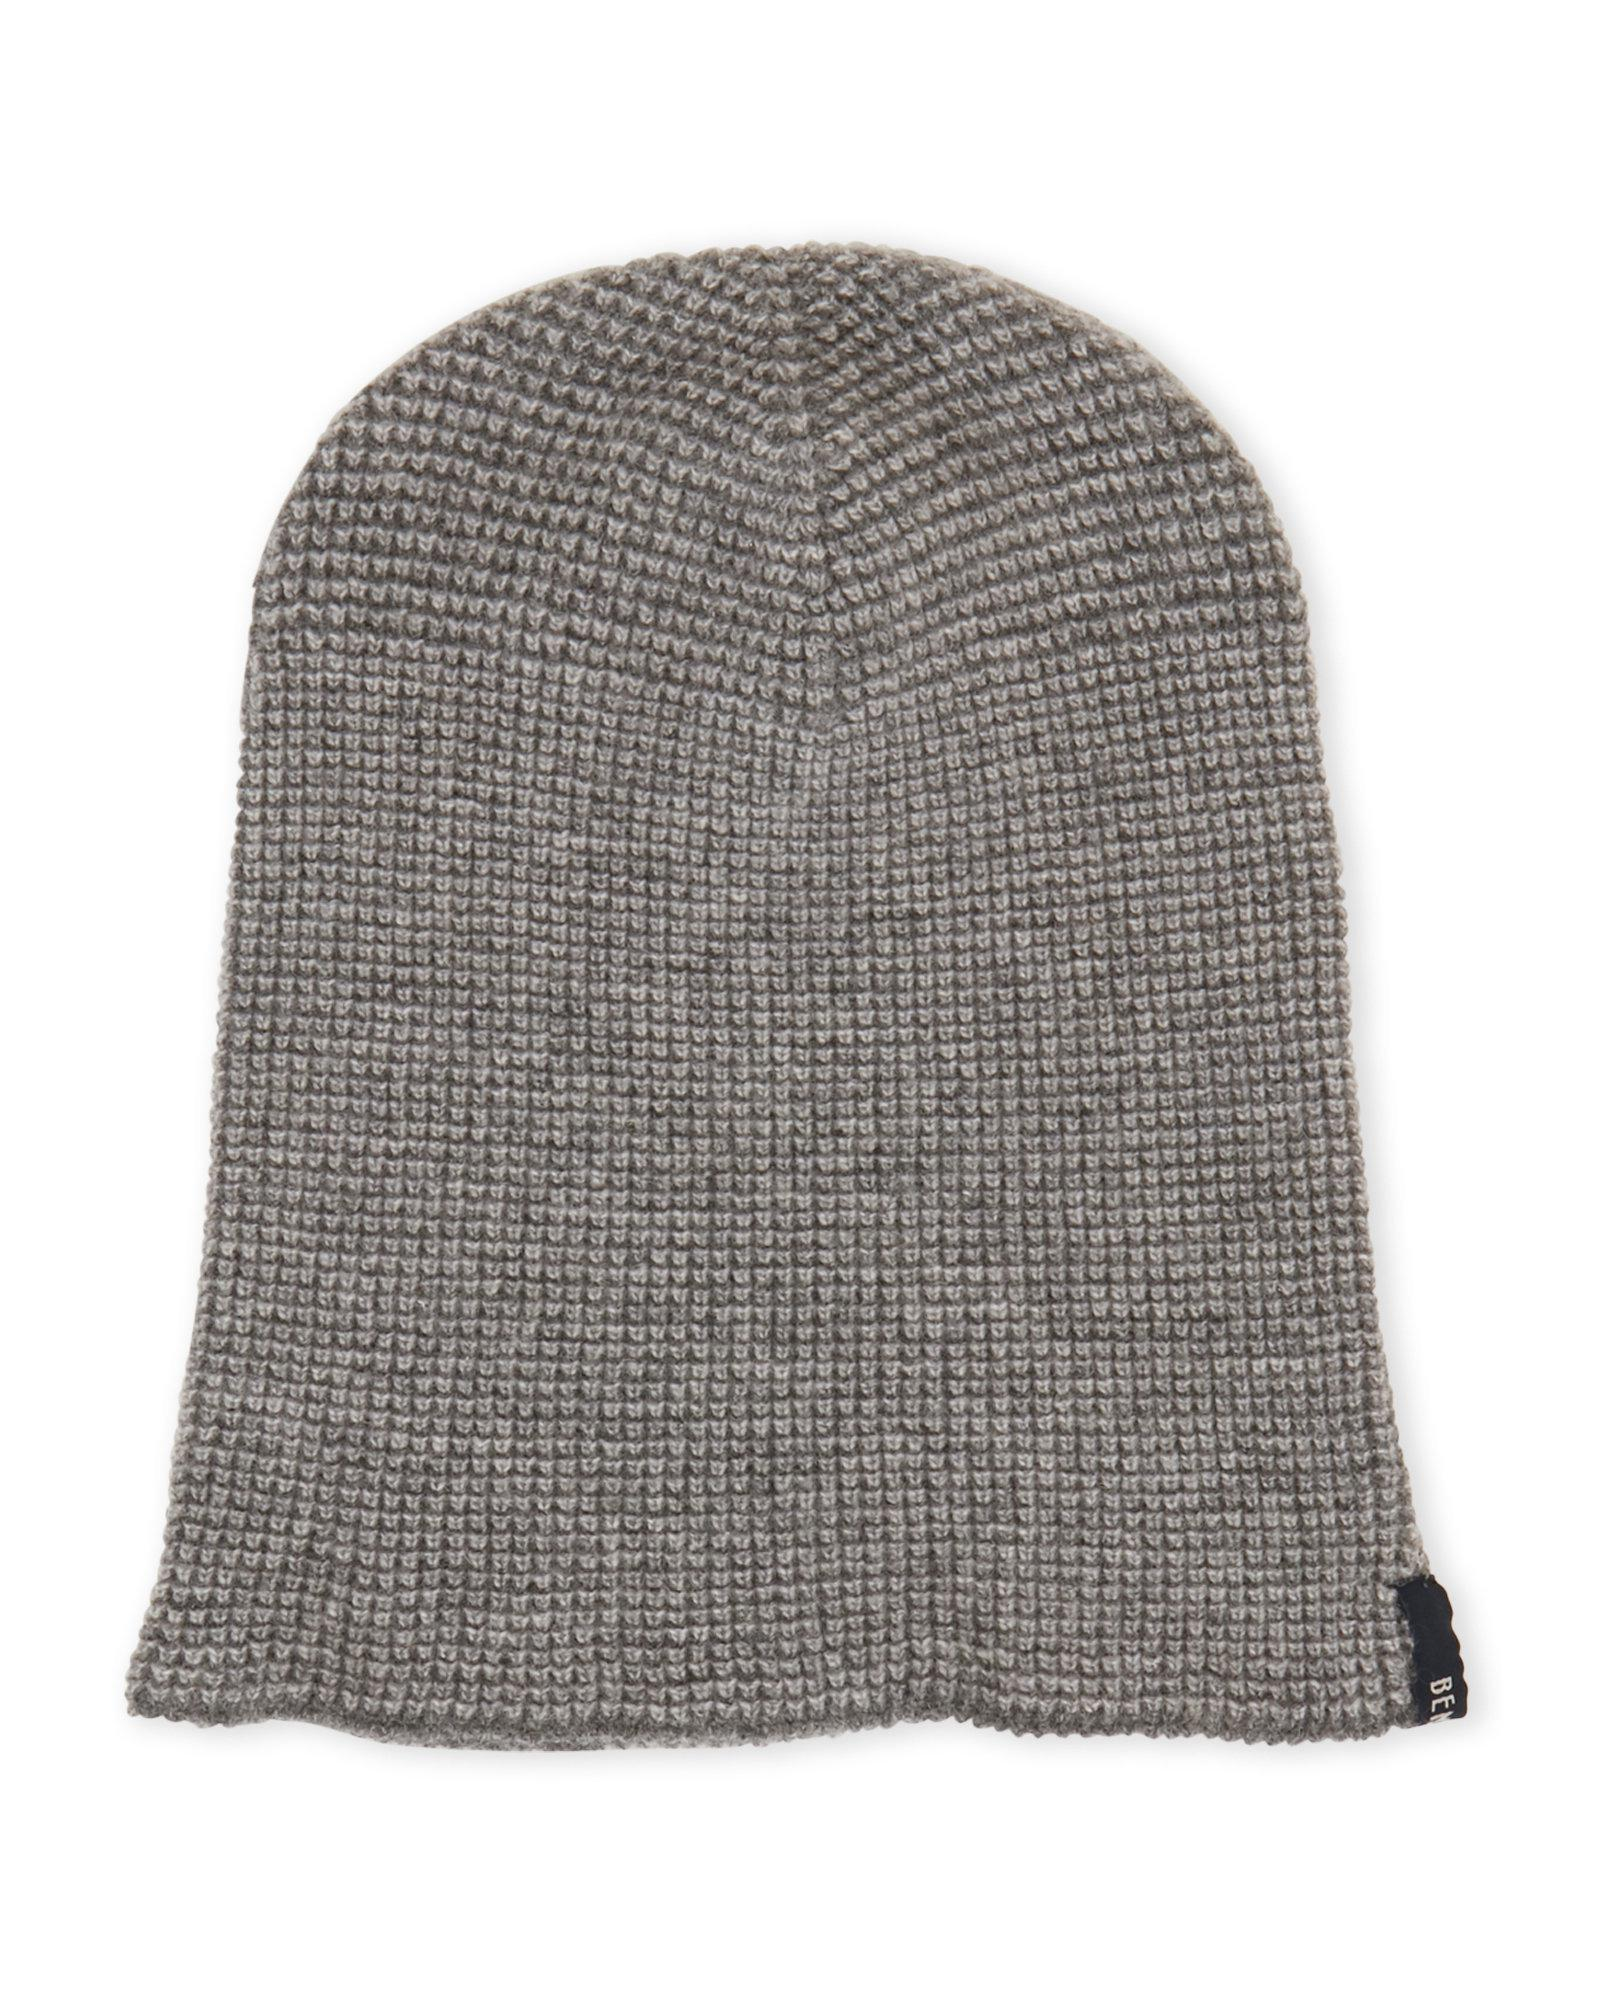 5af7ef0e57f Lyst - Benson Wool-Blend Knit Beanie in Gray